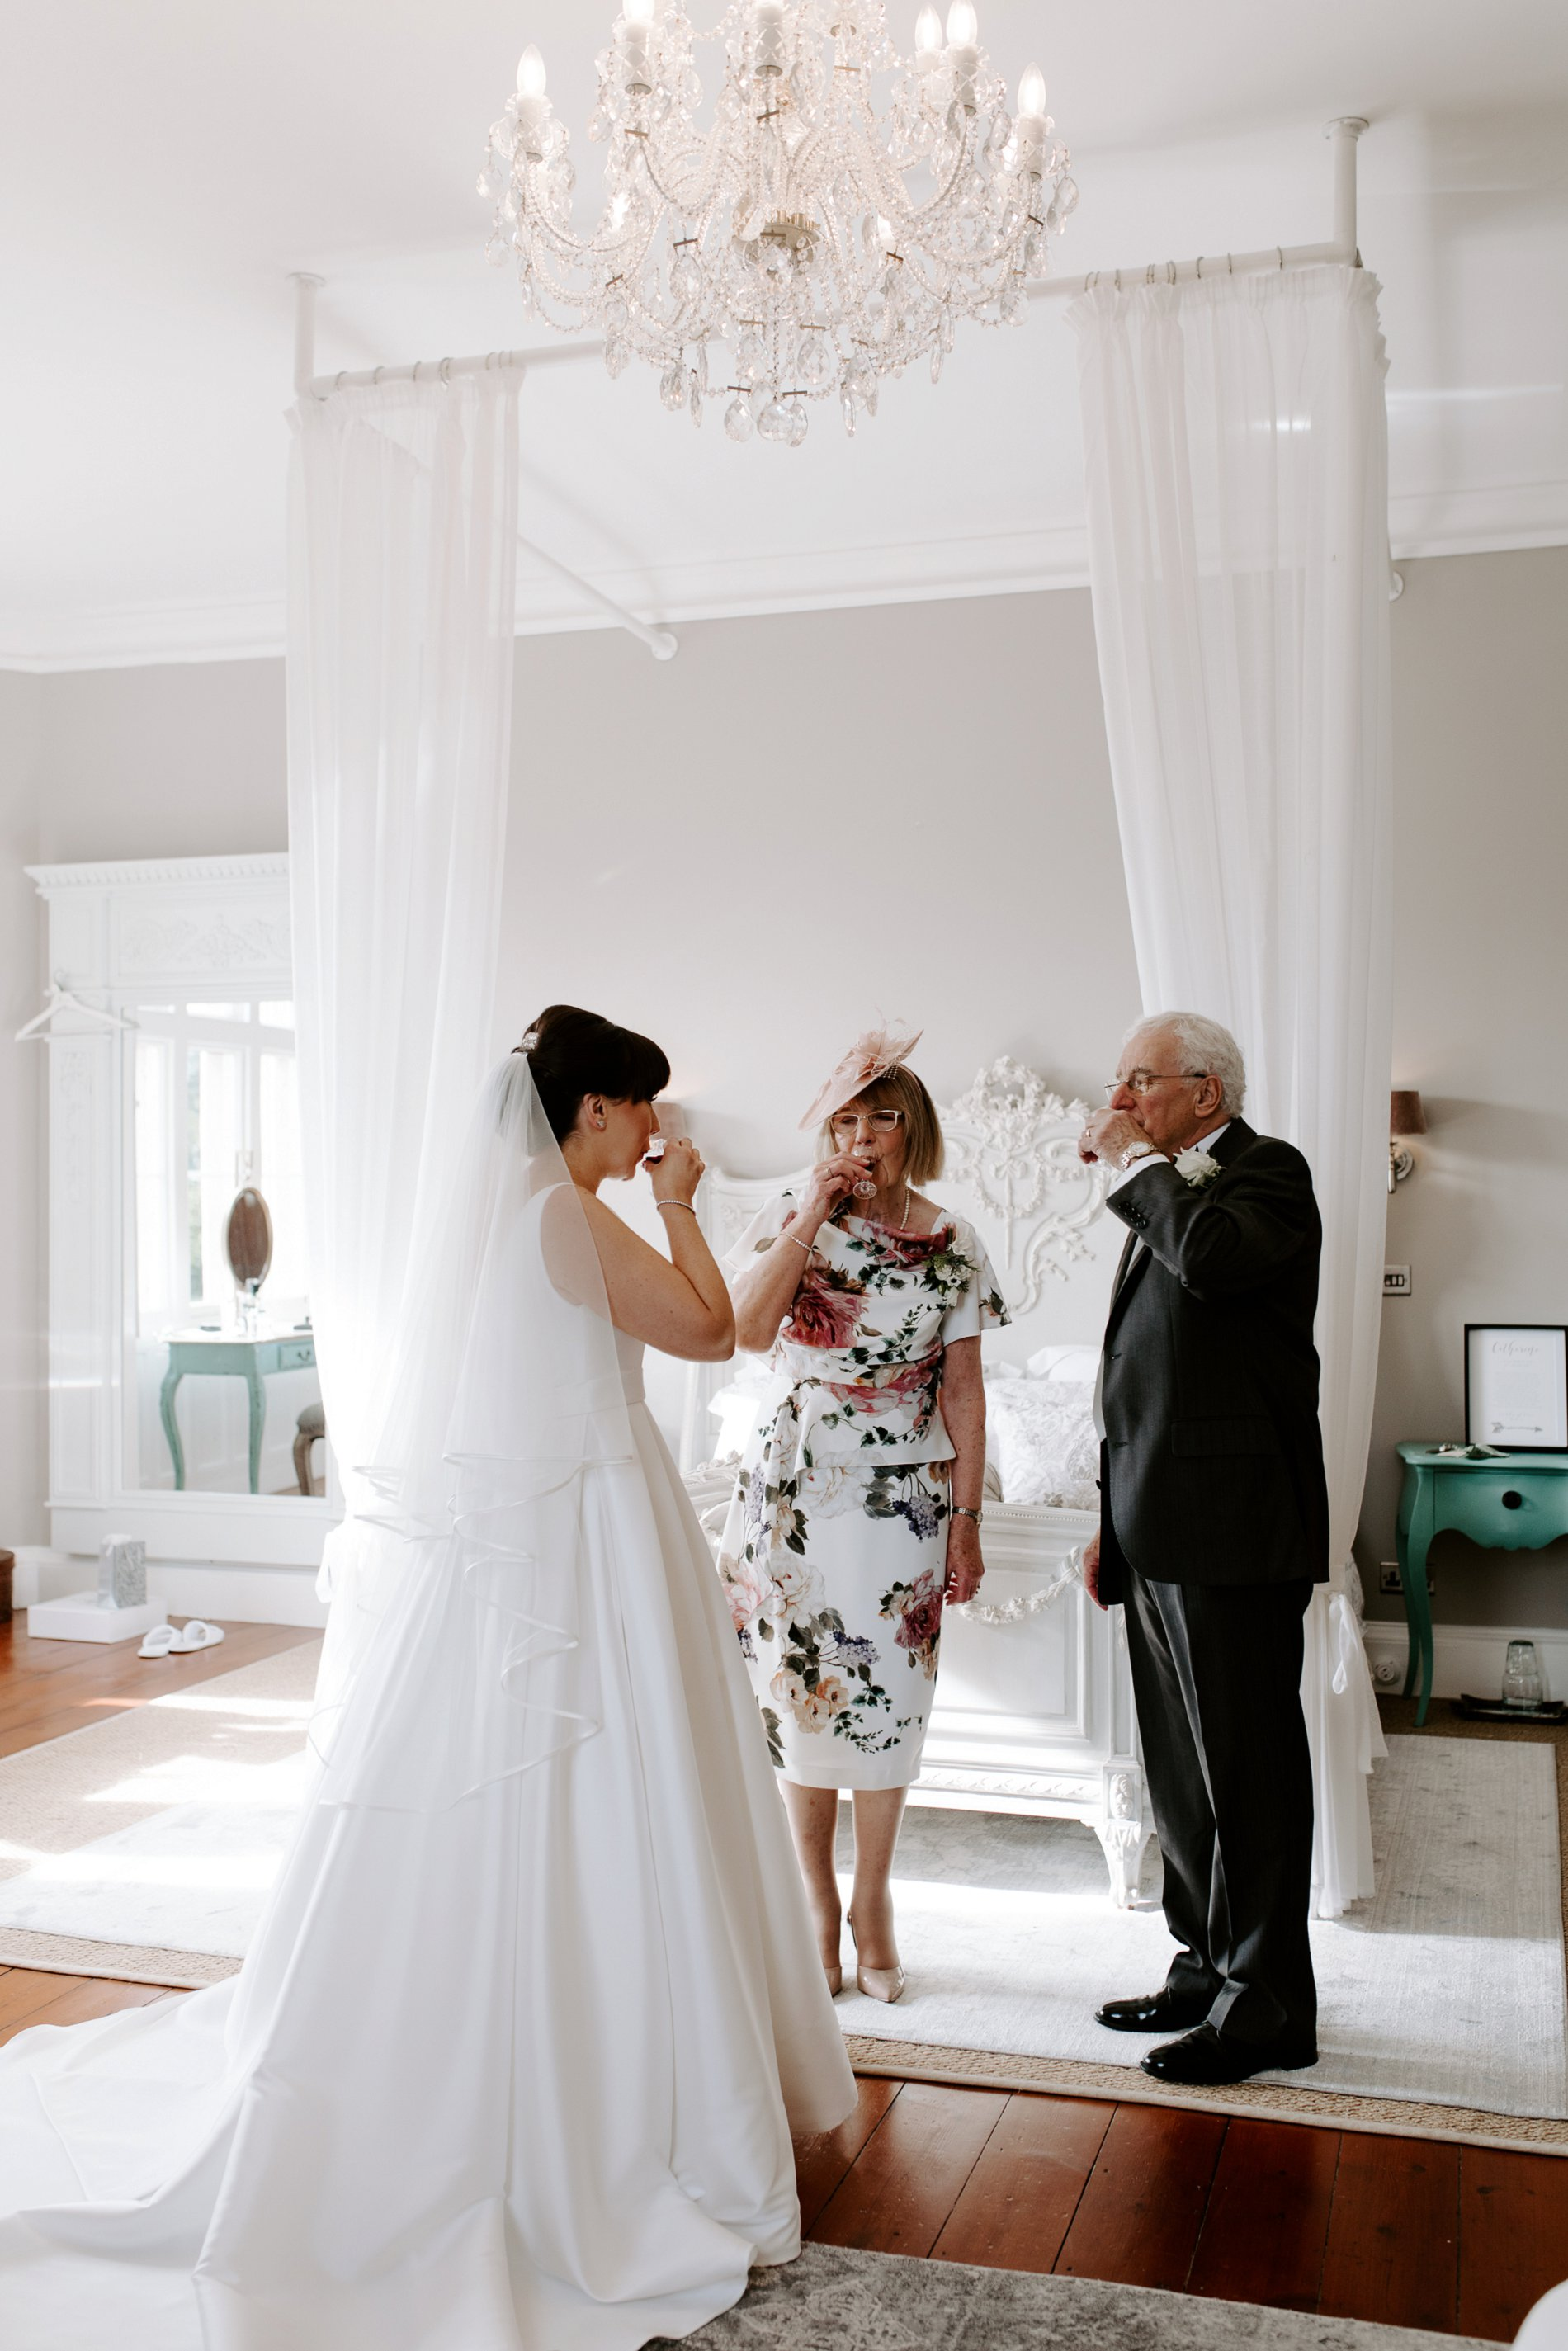 An Elegant White Wedding at Thicket Priory (c) Carla Whittingham Photography (30)